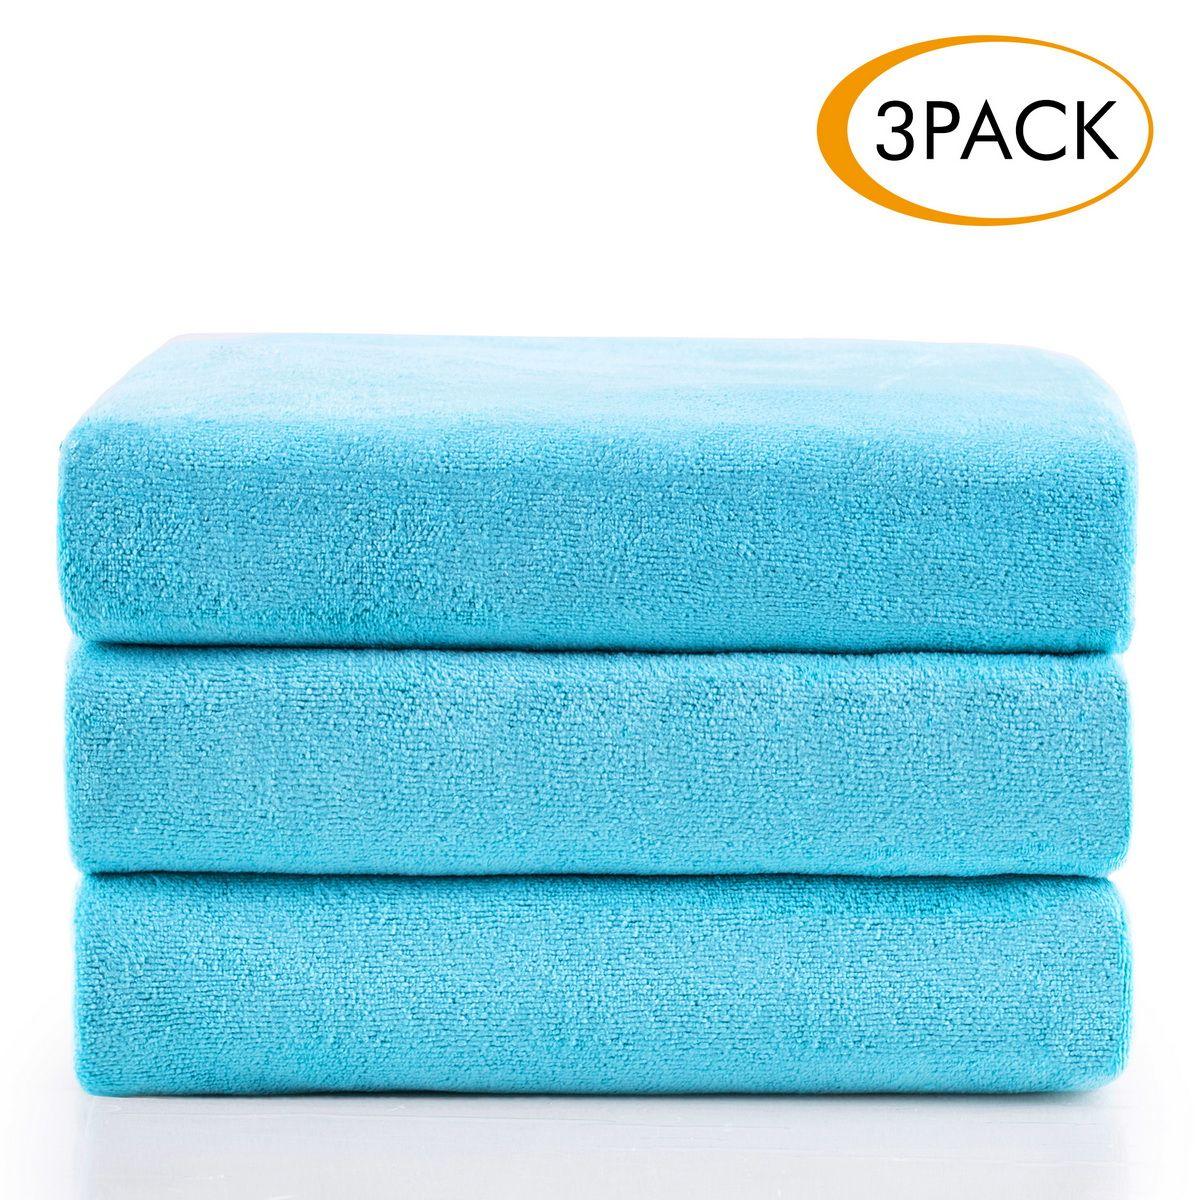 Ultra Soft Microfiber Bath Towel Large Gym Sport Travel TowelS Quick-Dry